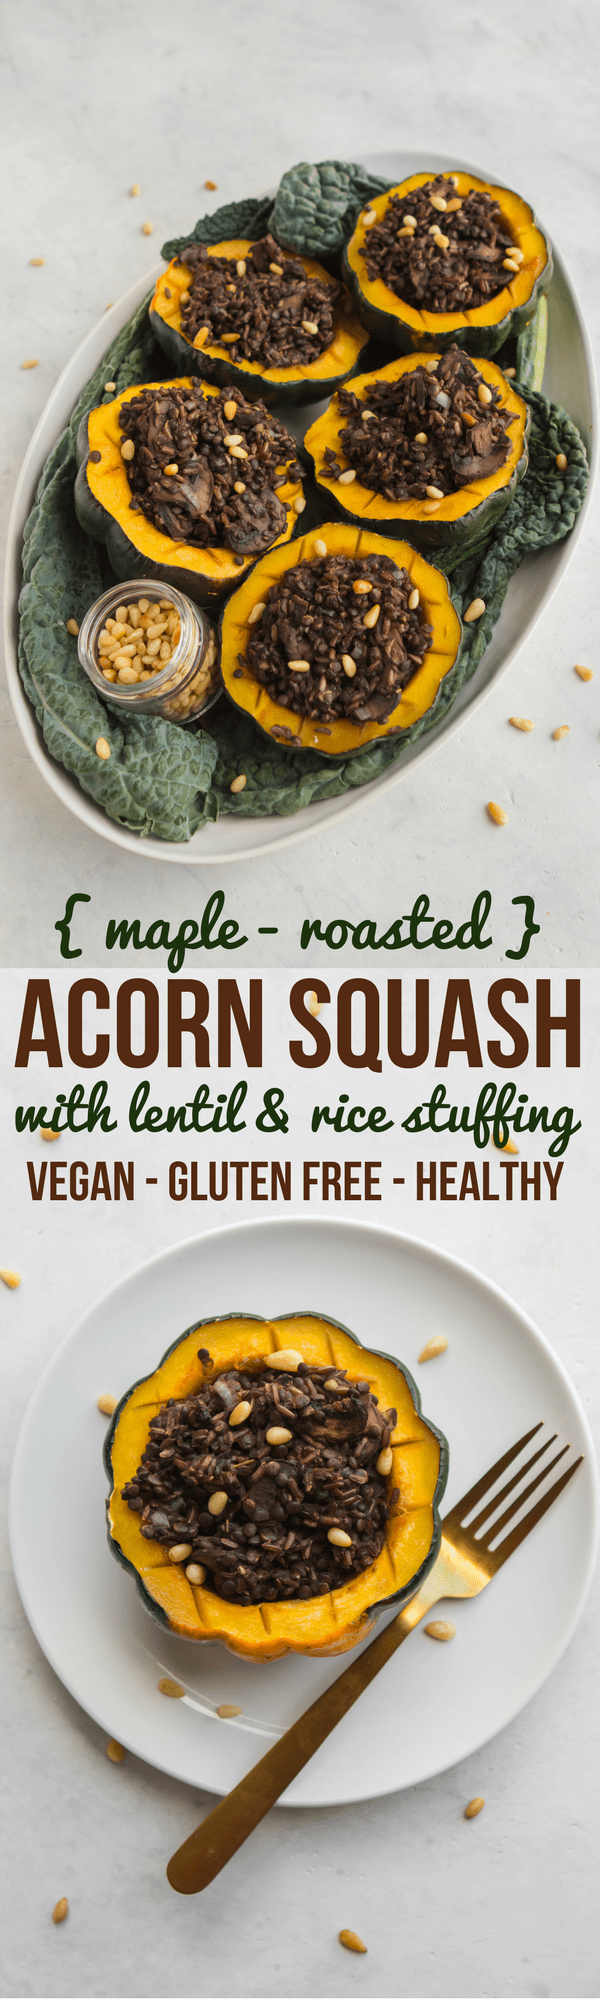 Maple Roasted Acorn Squash with Lentil, Rice, Mushroom Stuffing - Easy Holiday Recipe #vegan #plantbased